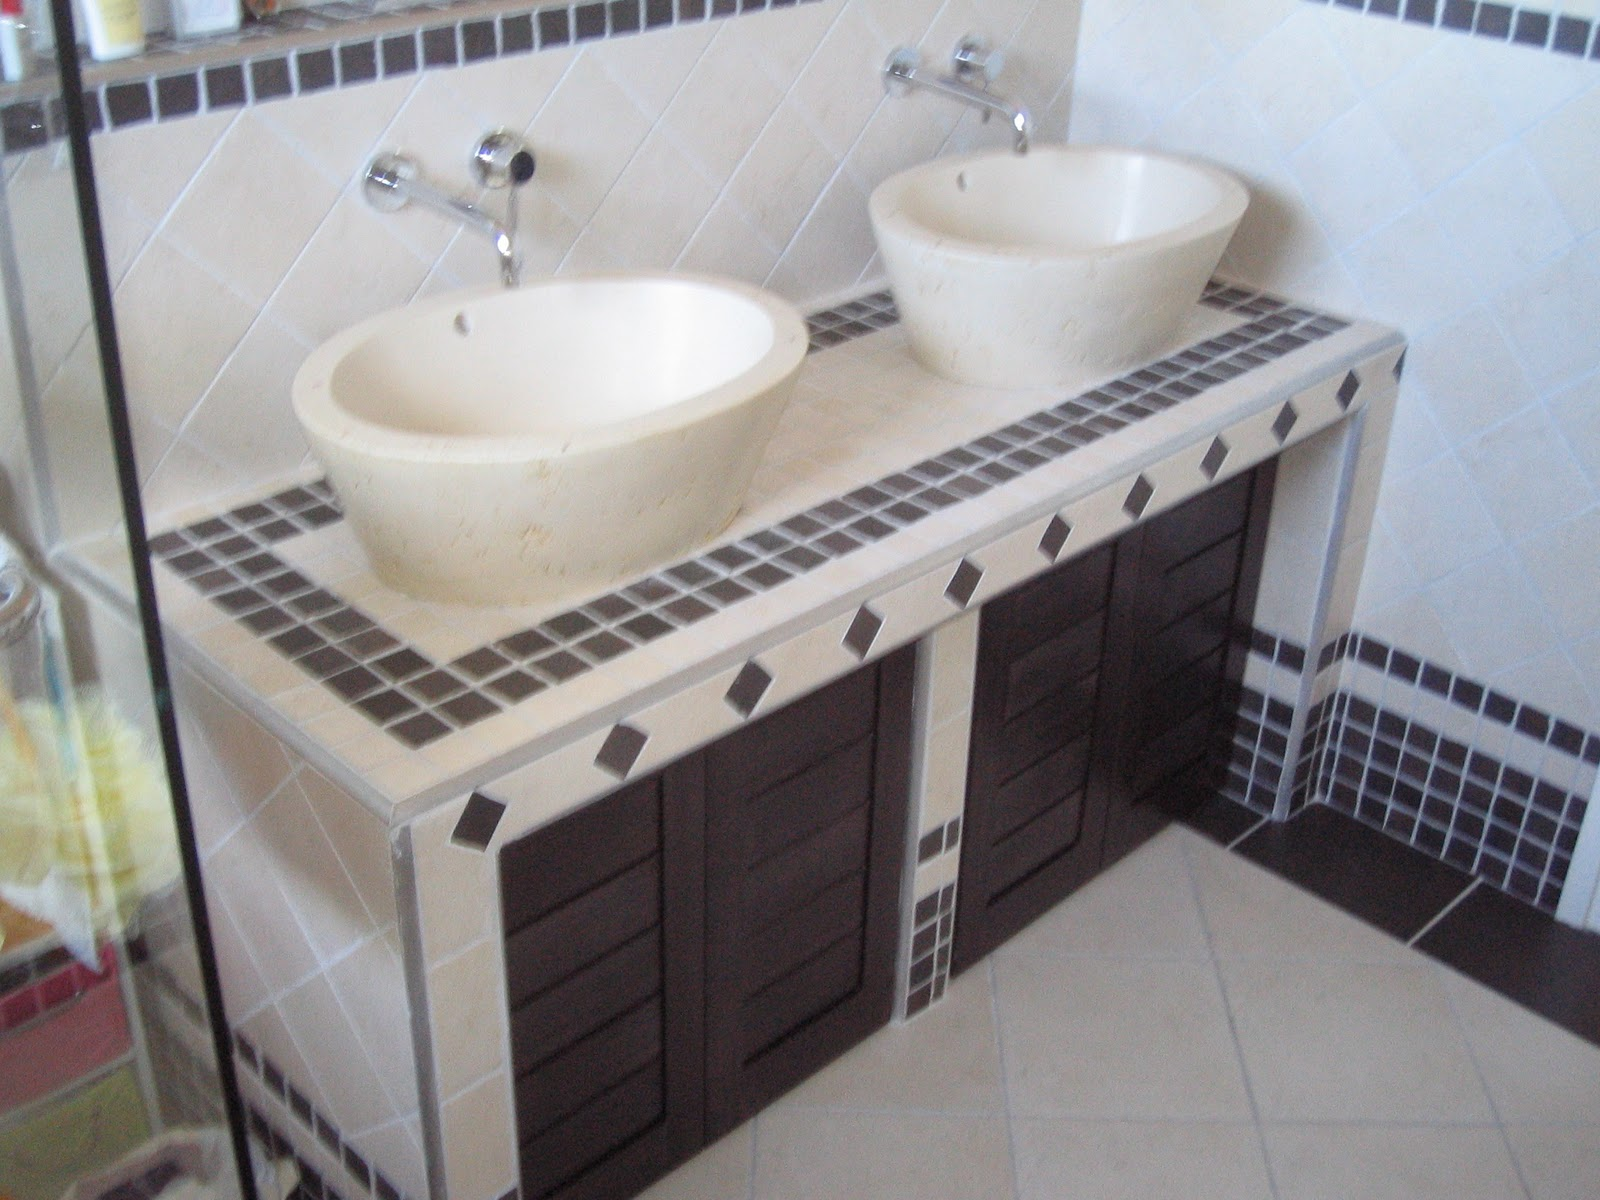 profil contre profil agencements interieurs. Black Bedroom Furniture Sets. Home Design Ideas